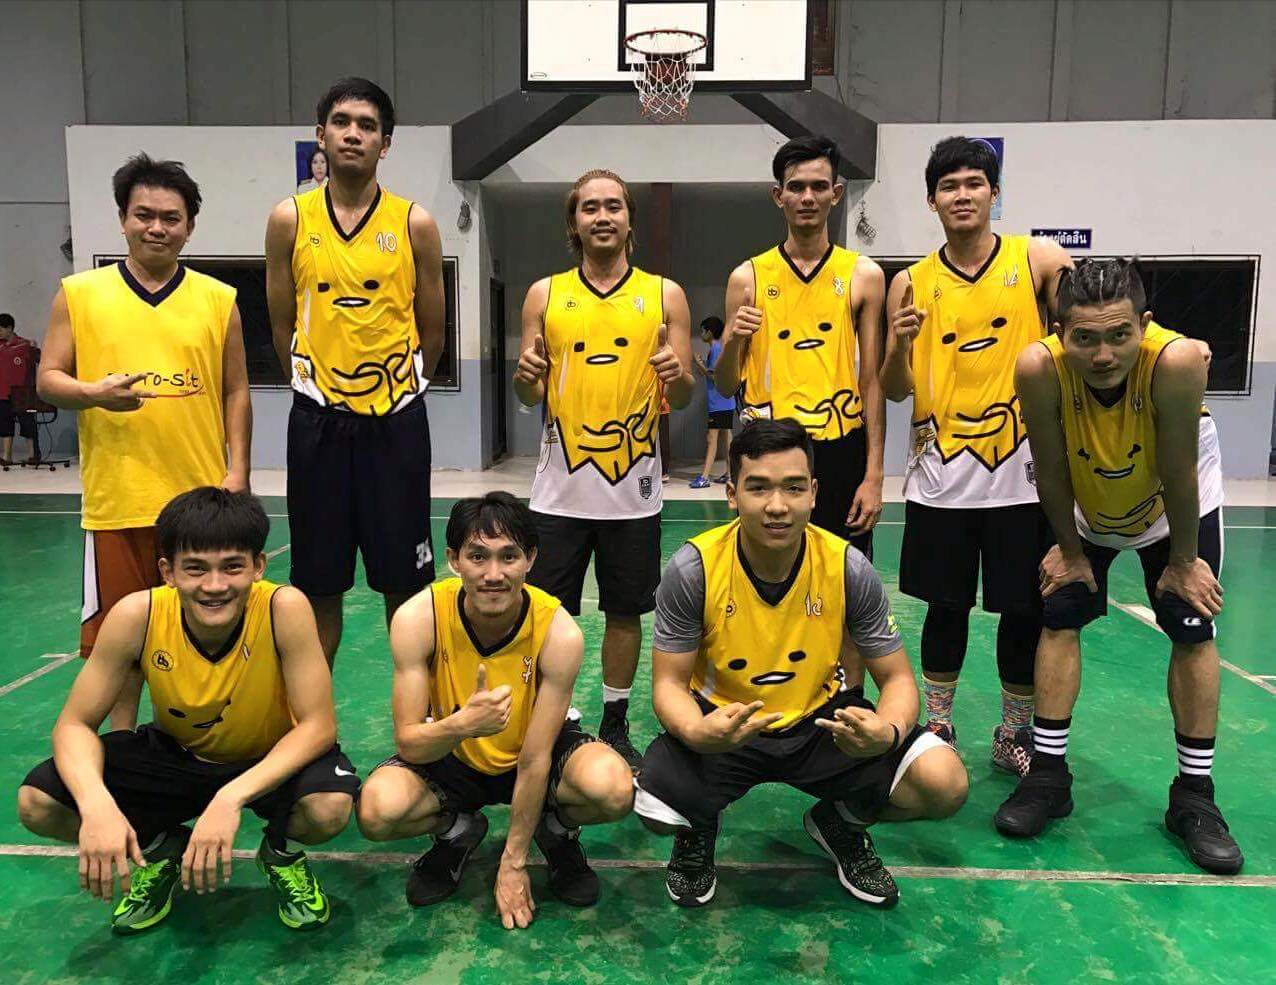 Yellow Basketball Jersey ทีมแข่งขันทัวร์นาเม้นท์ เสื้อโทนสีเหลือง